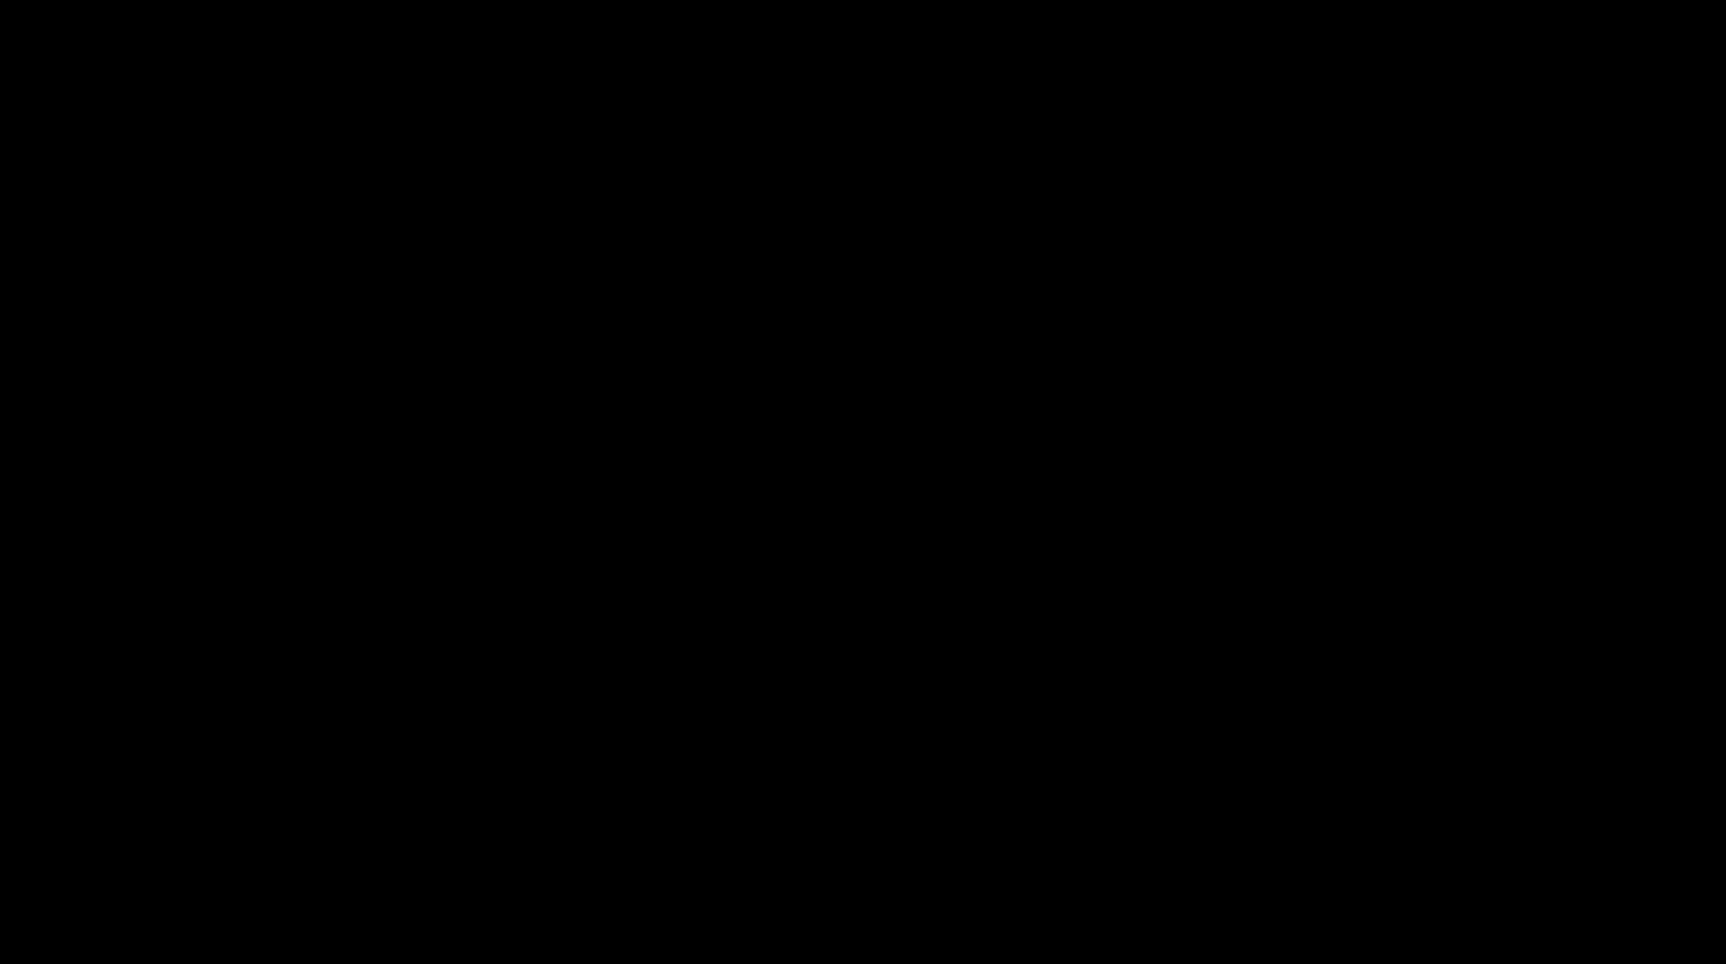 Texas Mason Animated Looping Flag